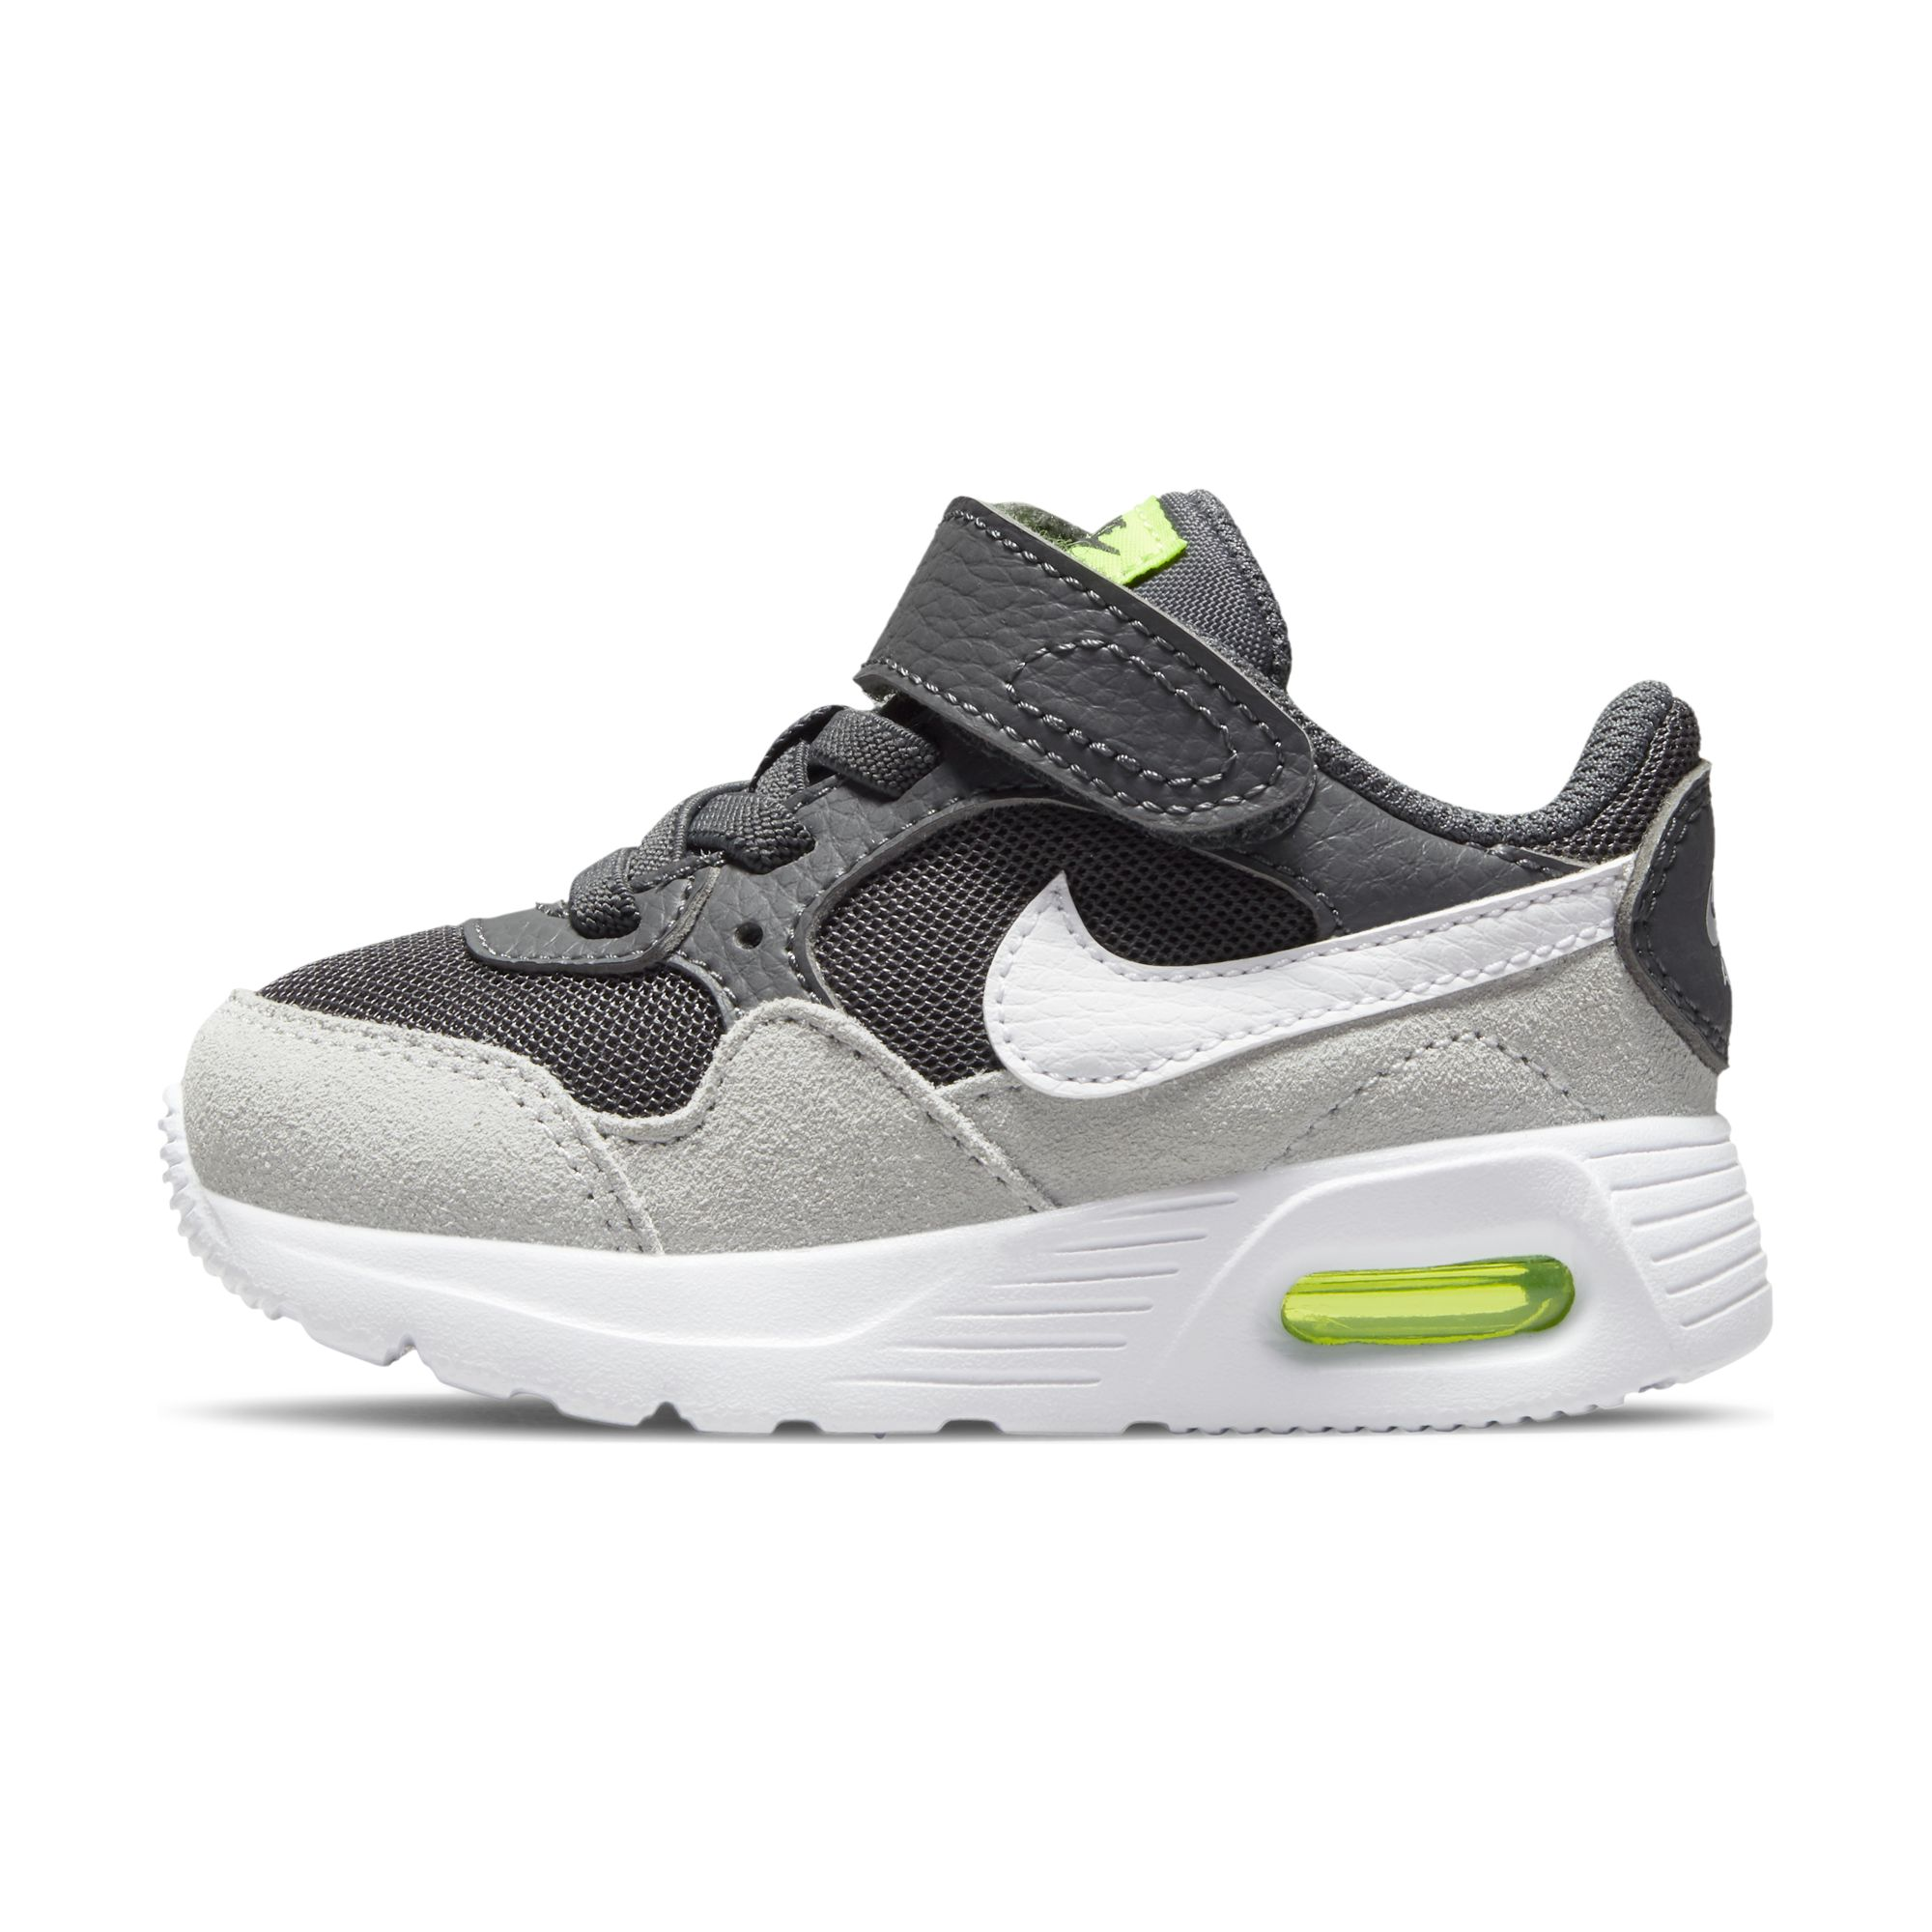 Air Max enfant Nike CZ5361 001